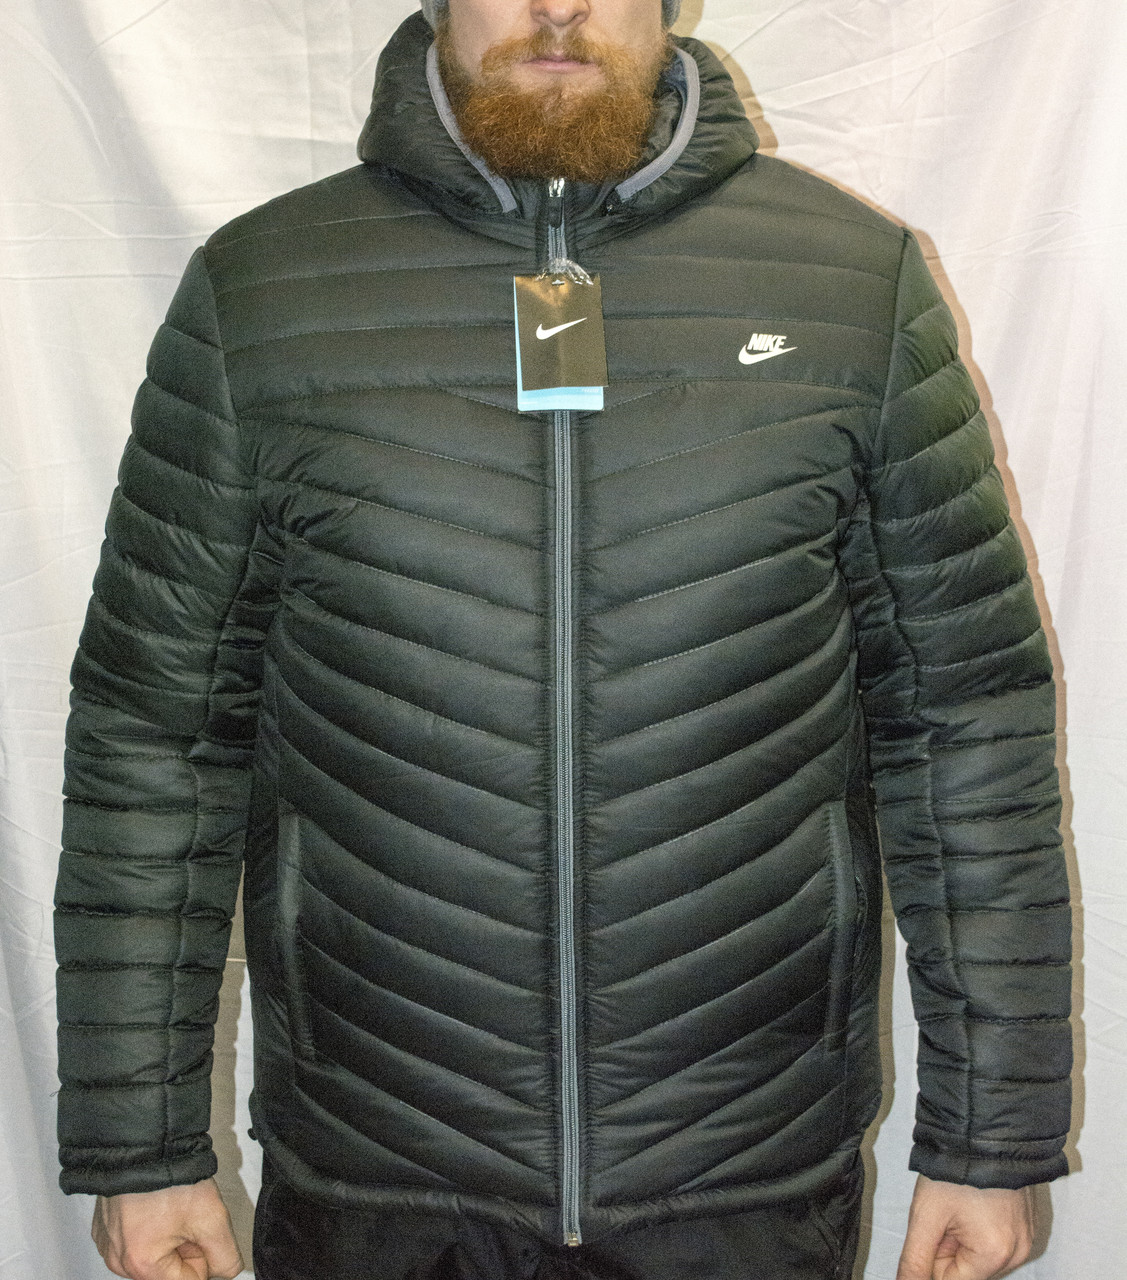 7ad11191 Мужская зимняя куртка Nike, теплая куртка Найк копия , цена 1 020 ...